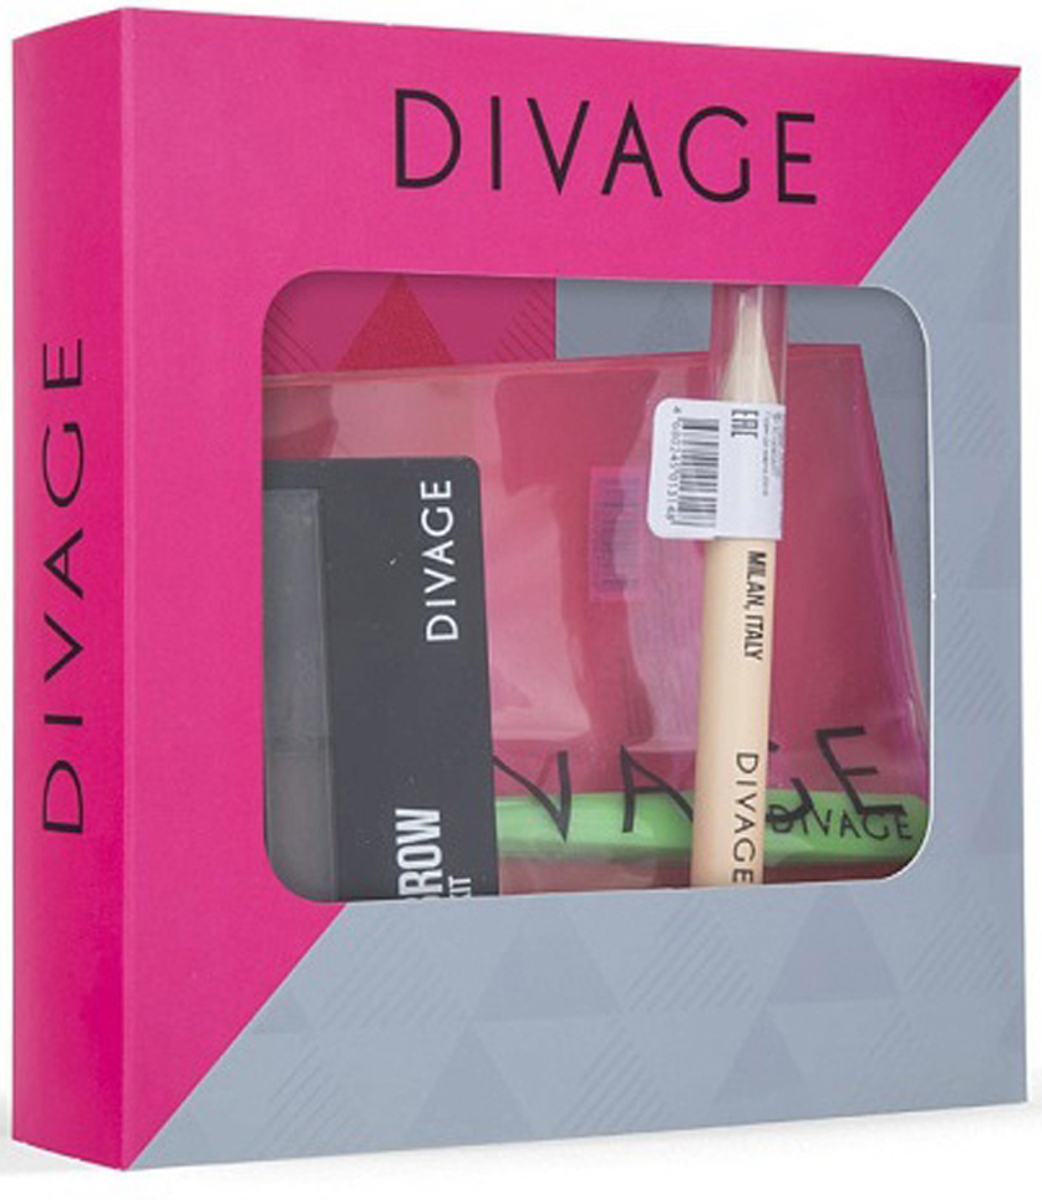 Divage Набор для моделирования формы бровей Eyebrow Styling Kit: Хайлайтер для бровей, тон №01 + Пинцет для бровей набор для бровей absolute new york hd eyebrow kit 03 цвет aebk03 brunette variant hex name 917661